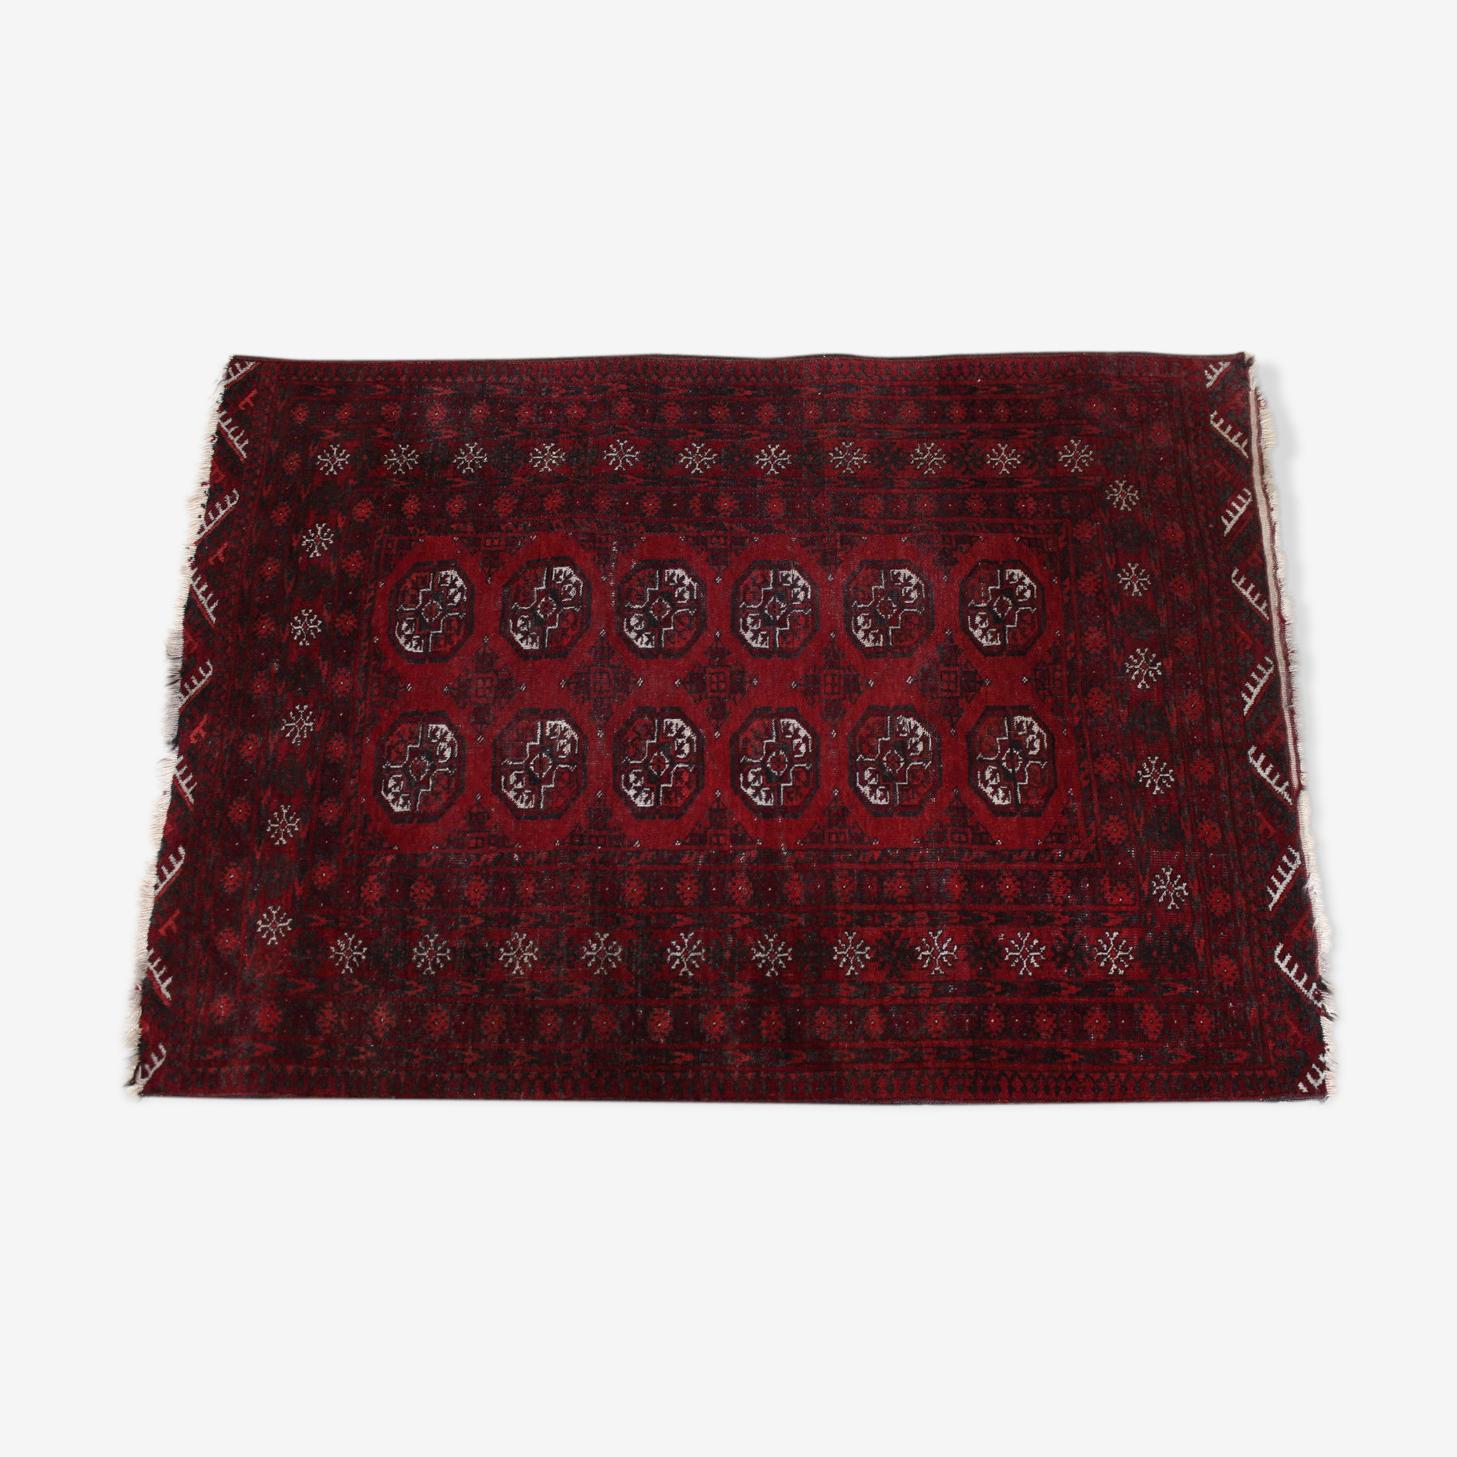 Turkish Turkish Persian rug bokhara 184 x 130 cm wool Bukhara